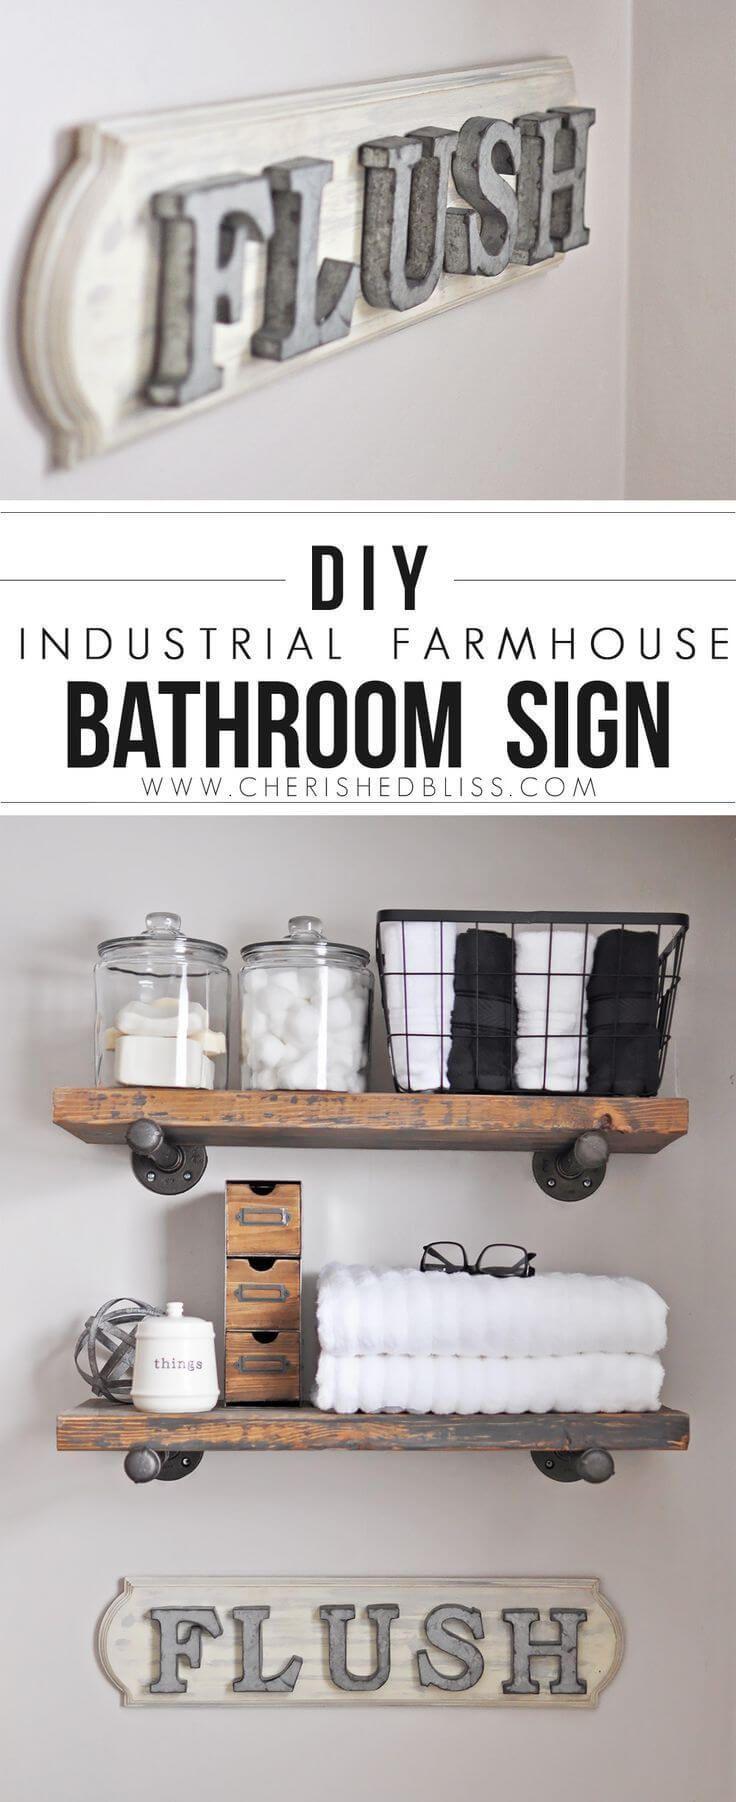 Pin by Sadie Hargis on House creative ideas | Pinterest | Bathroom ...